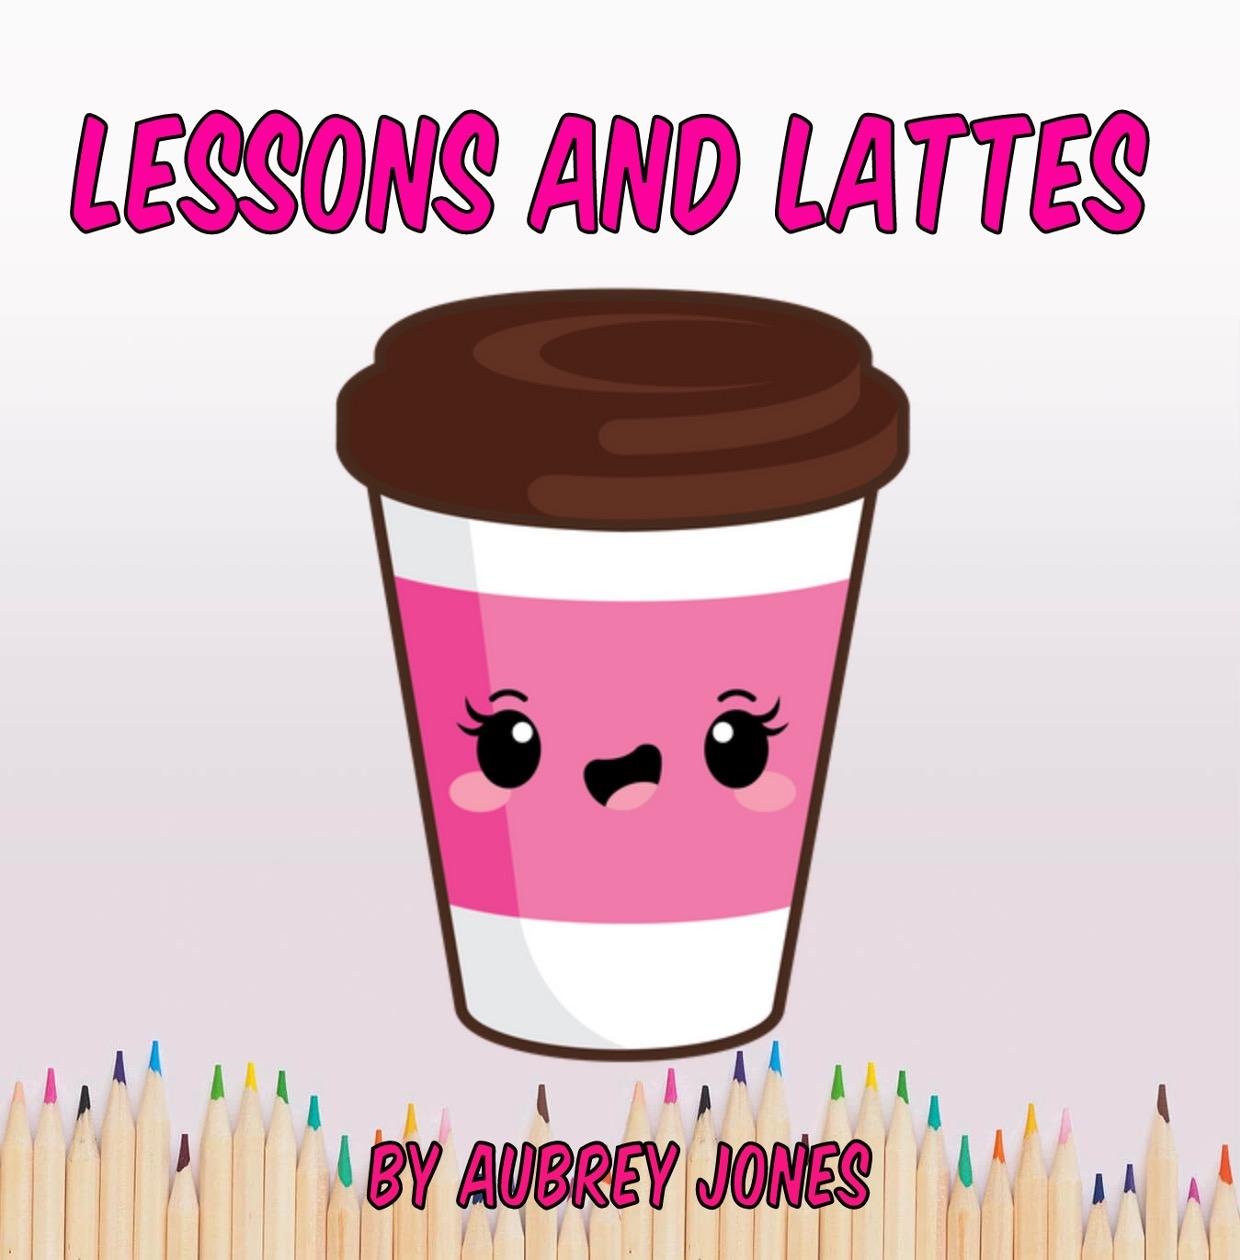 Lessons & Lattes by Aubrey Jones